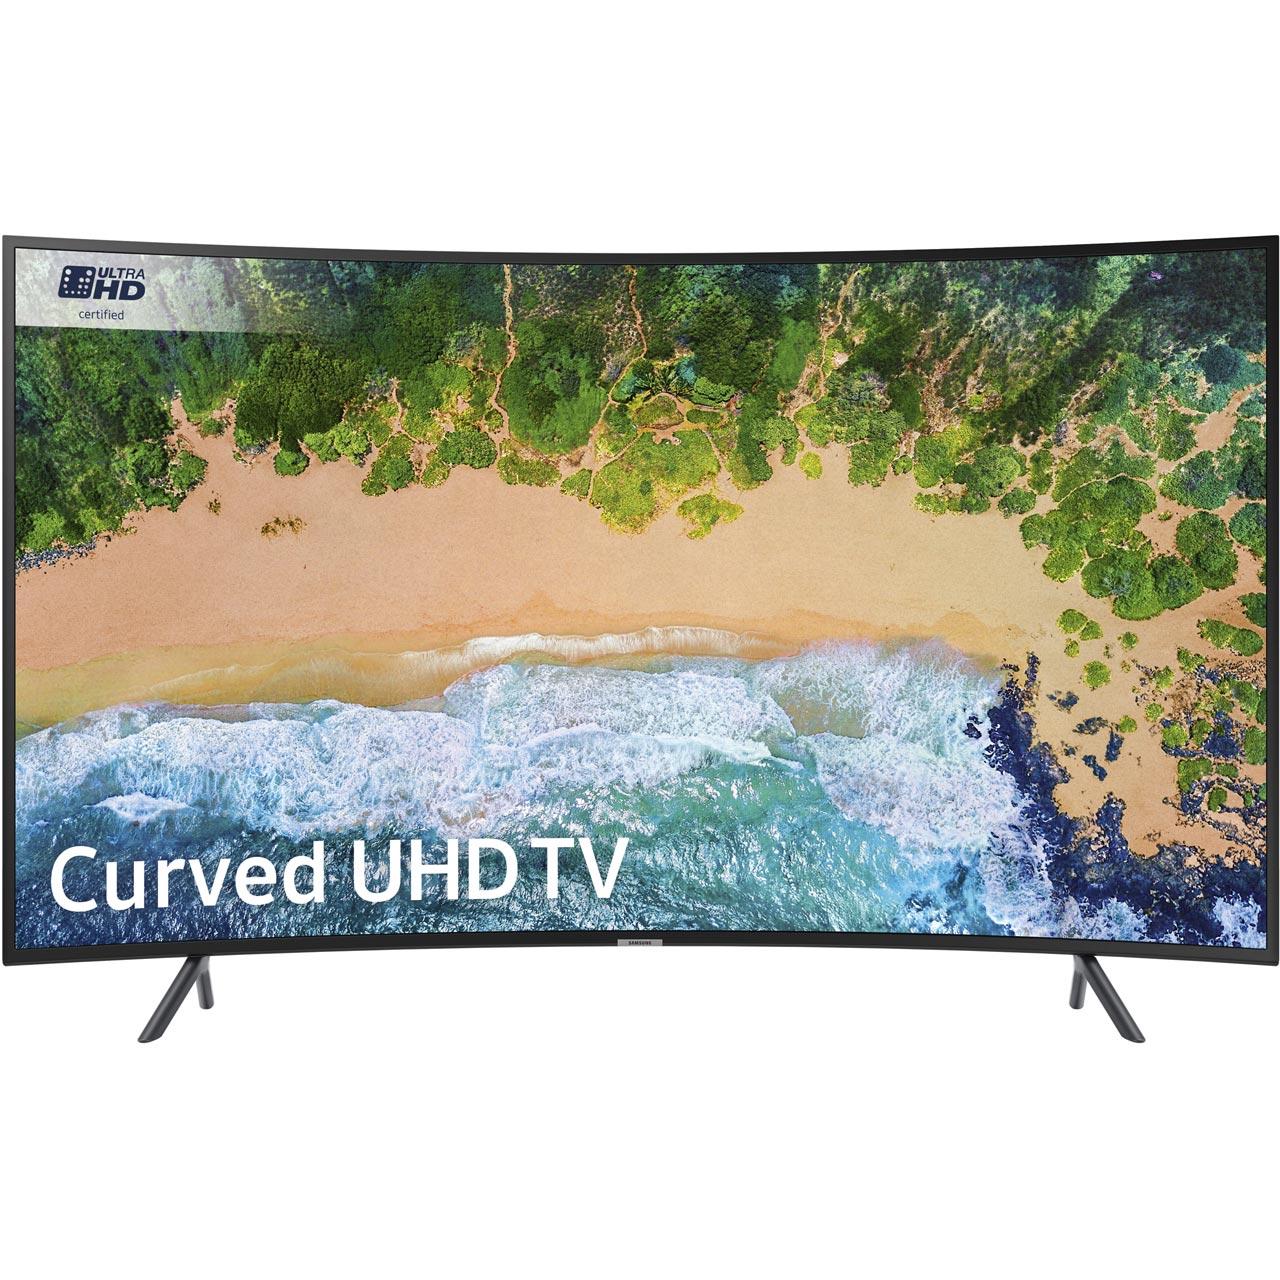 "Samsung UE49NU7300 49"" Curved Smart 4K Ultra HD TV with HDR - UE49NU7300 - 1"